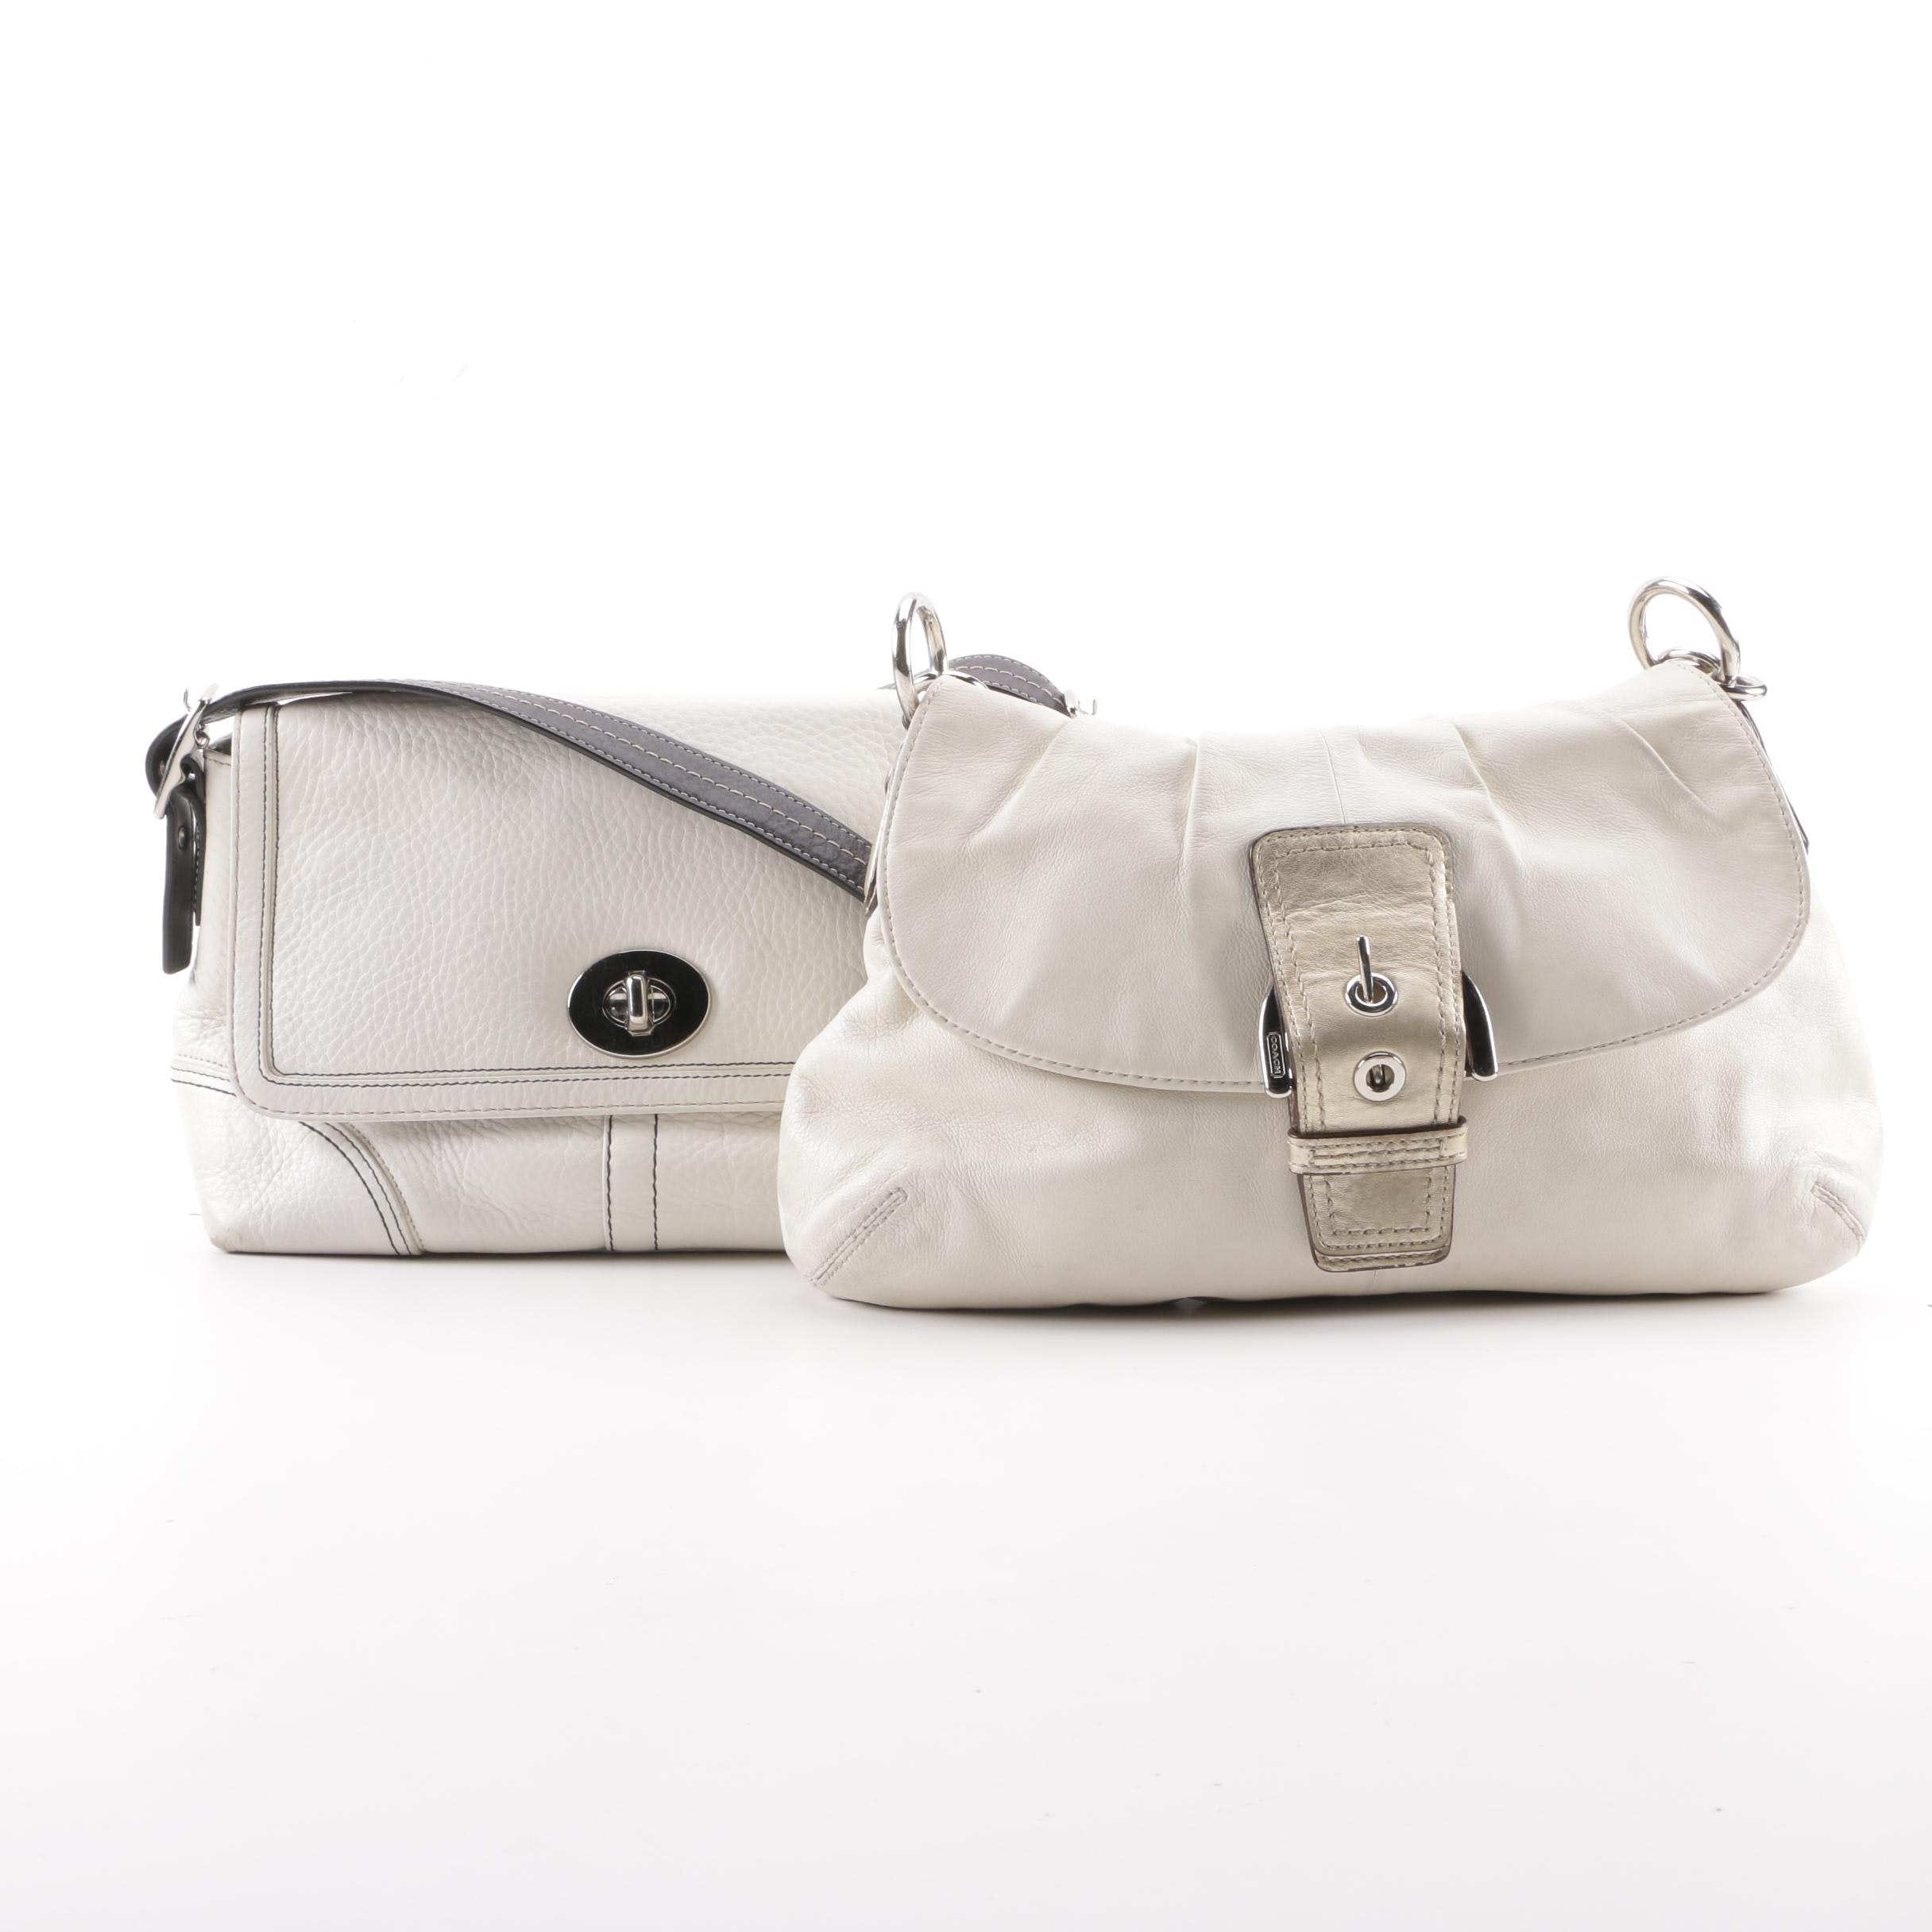 Coach Soho Pleated Leather Hobo Bag and Hampton Flap Leather Crossbody Bag